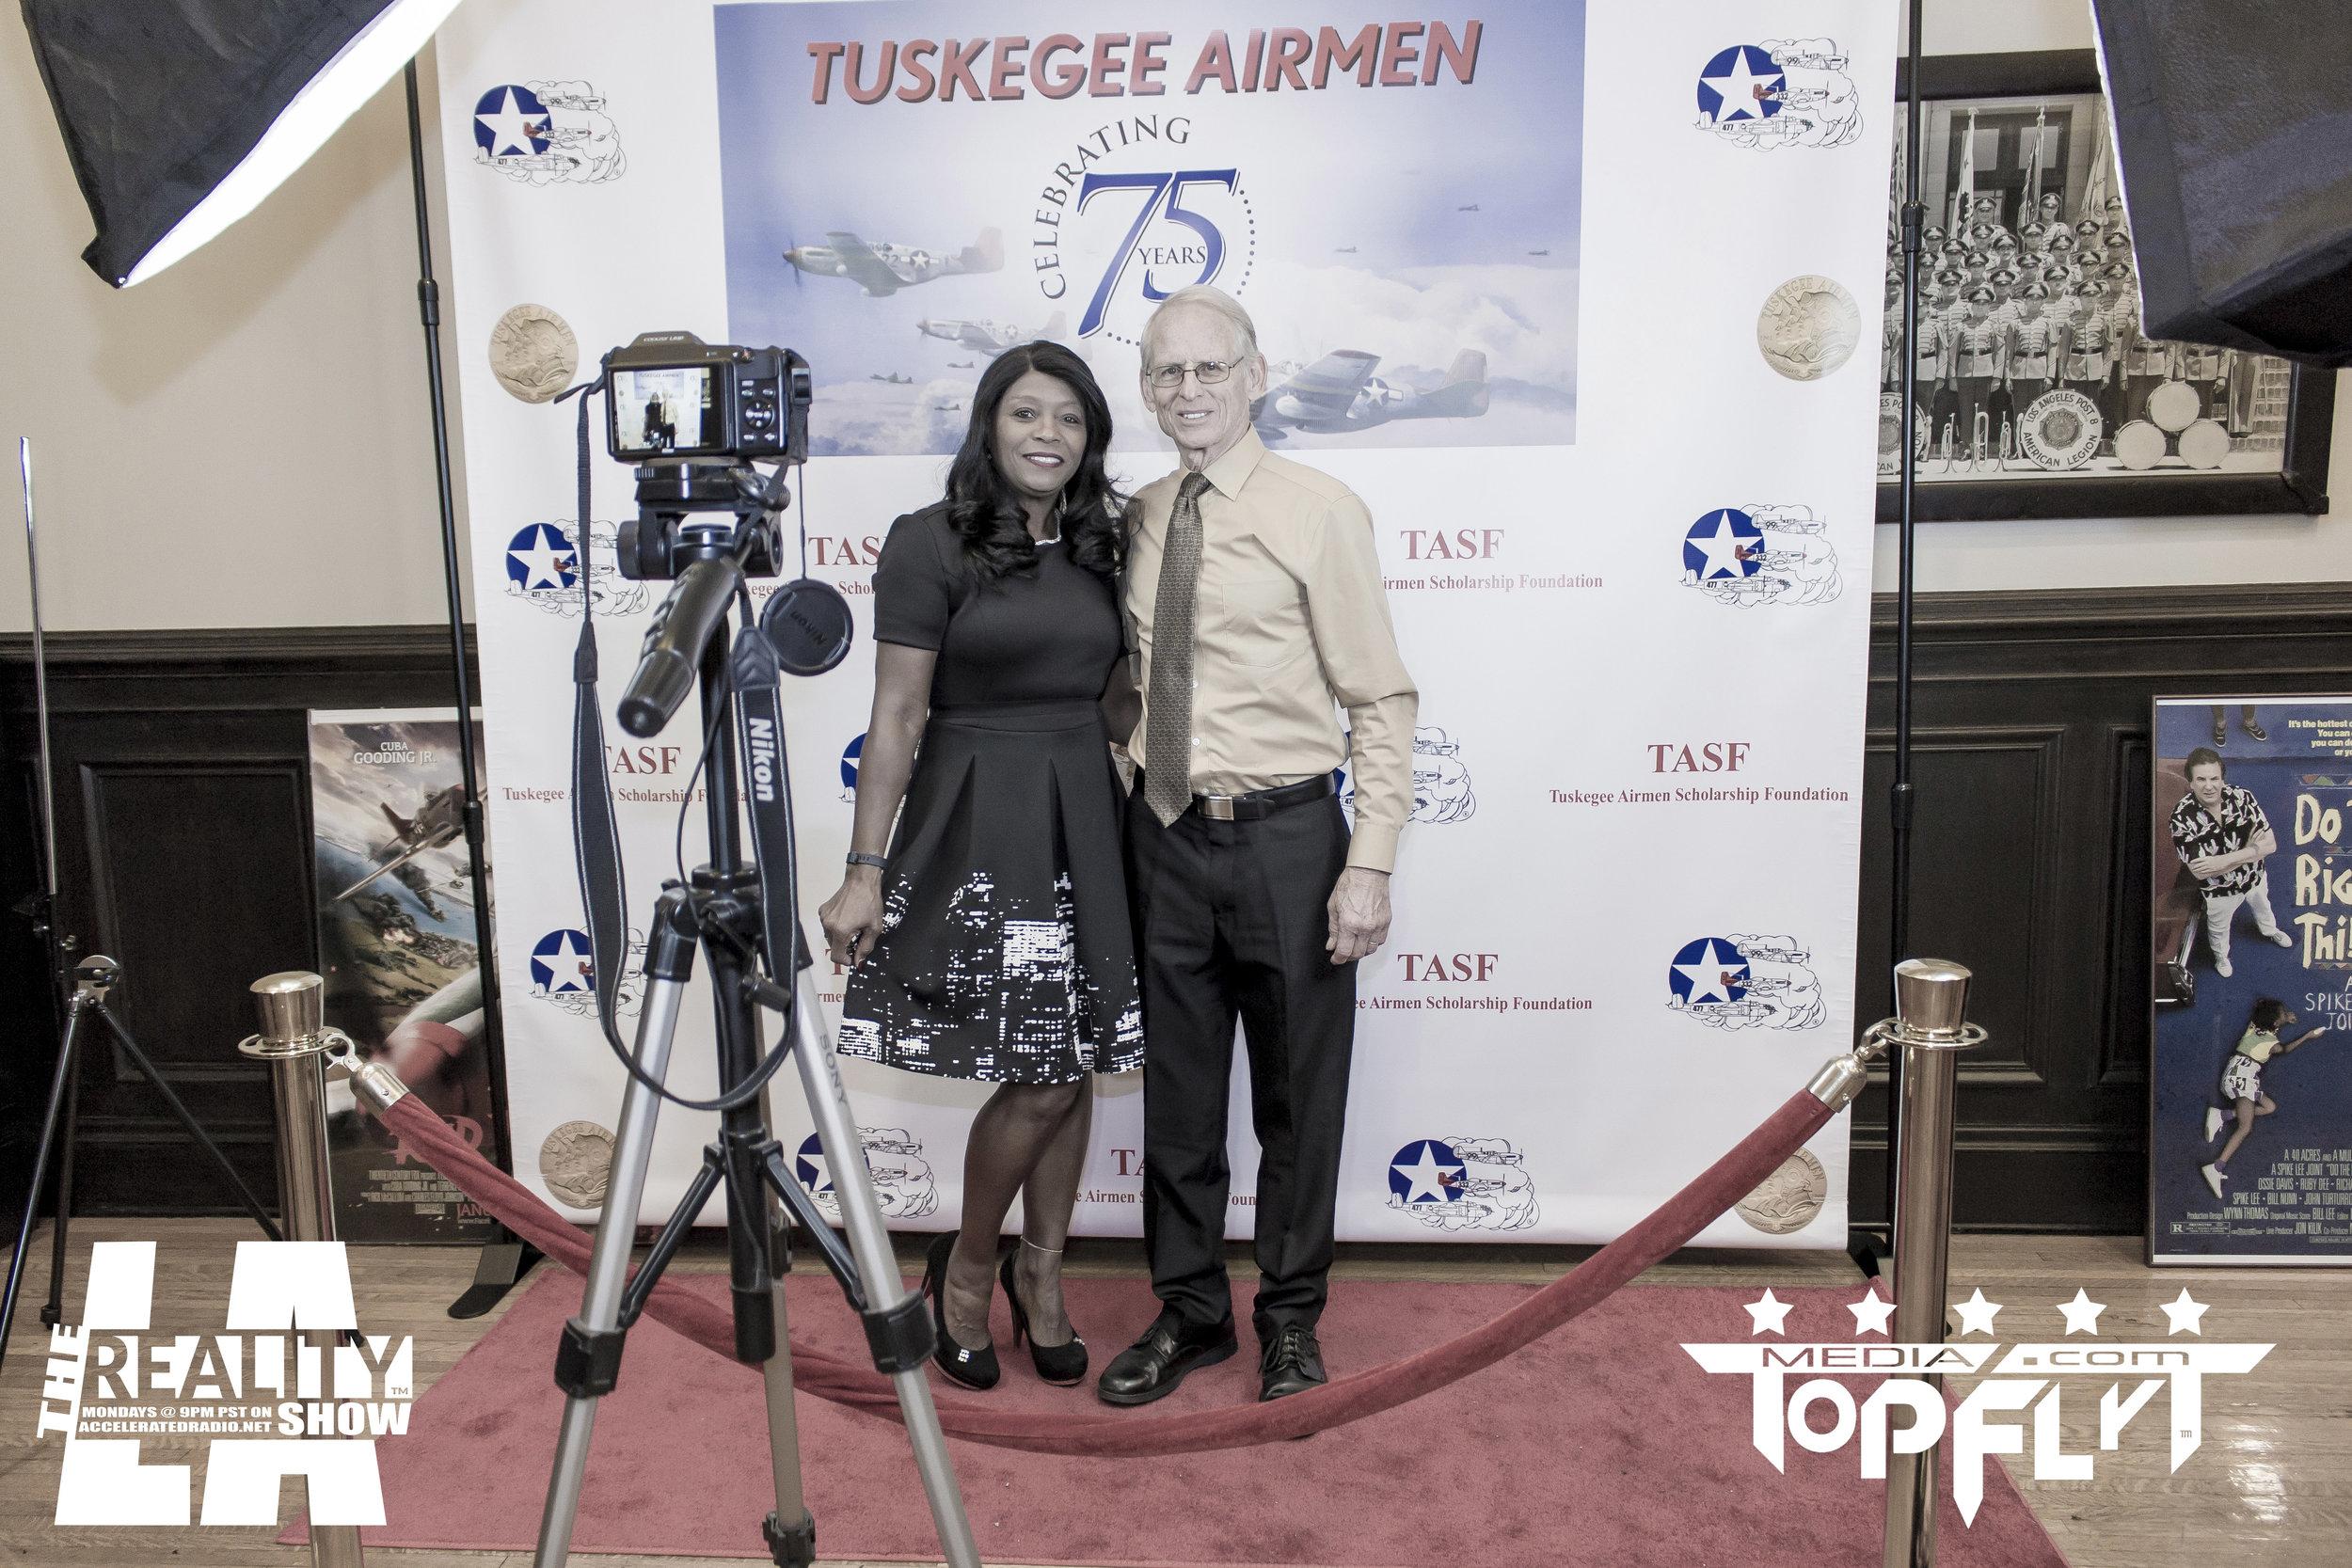 The Reality Show LA - Tuskegee Airmen 75th Anniversary VIP Reception_58.jpg